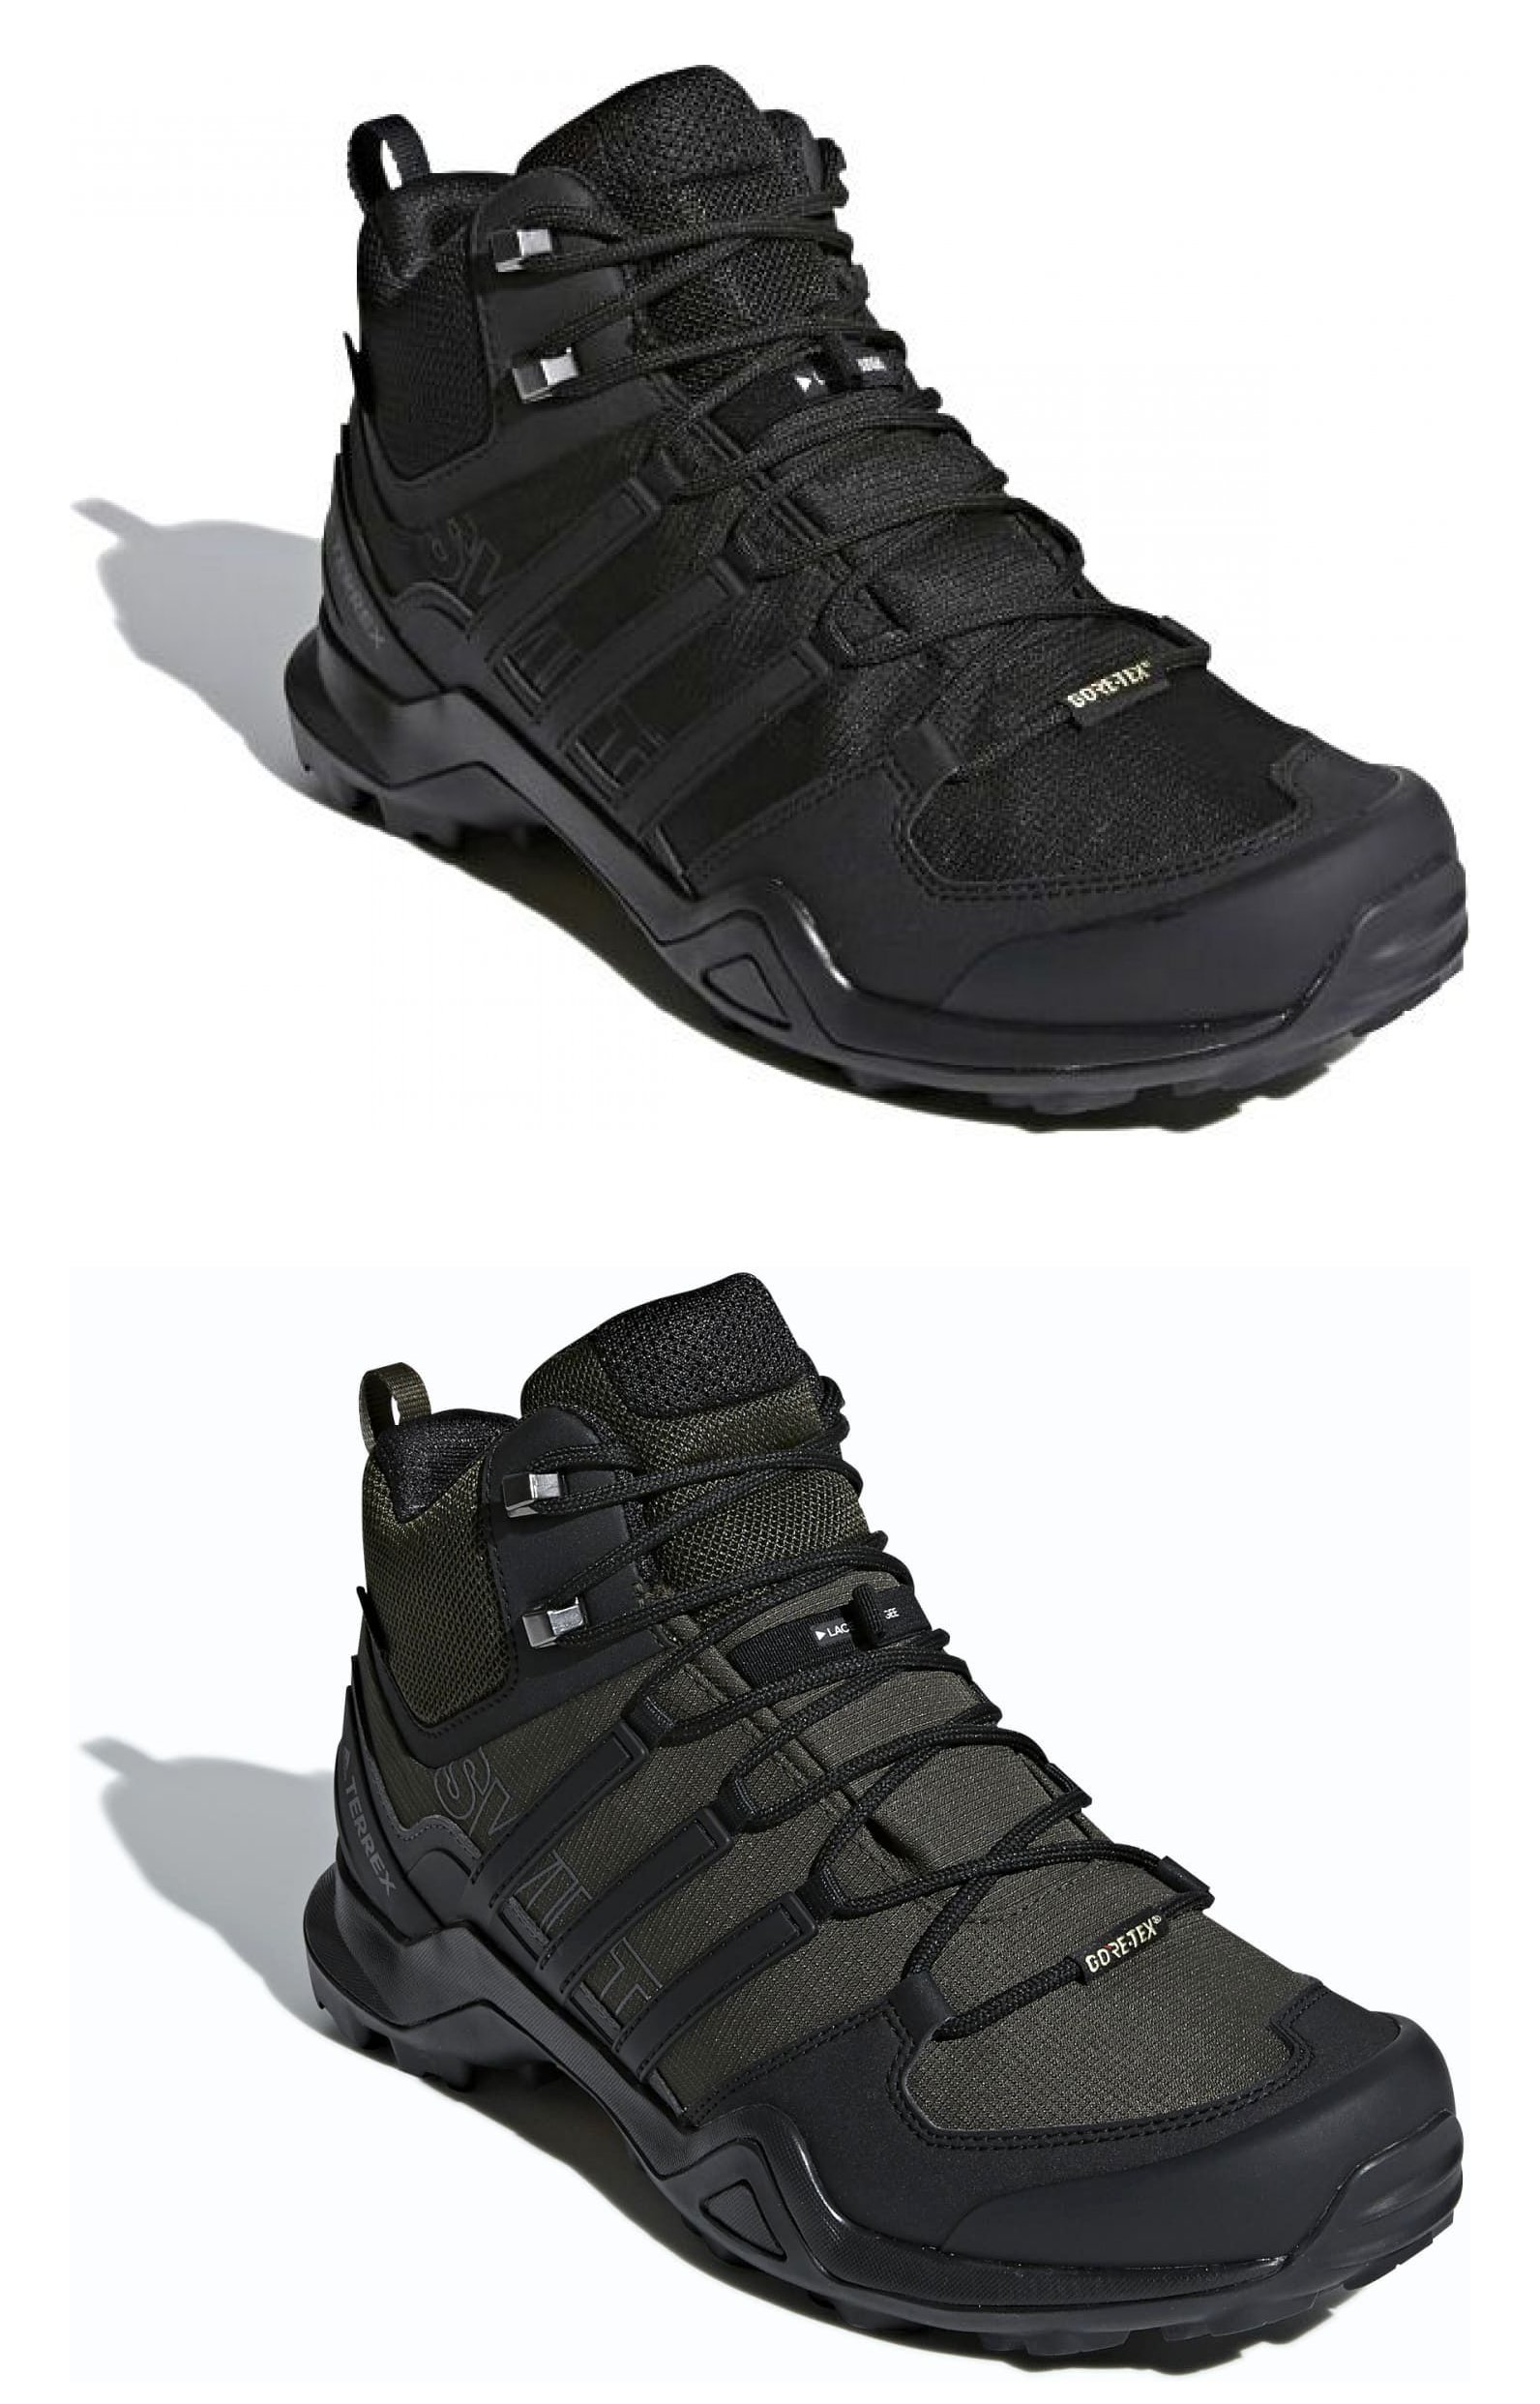 adidas terrex swift r2 mid gtx hiking shoes online -